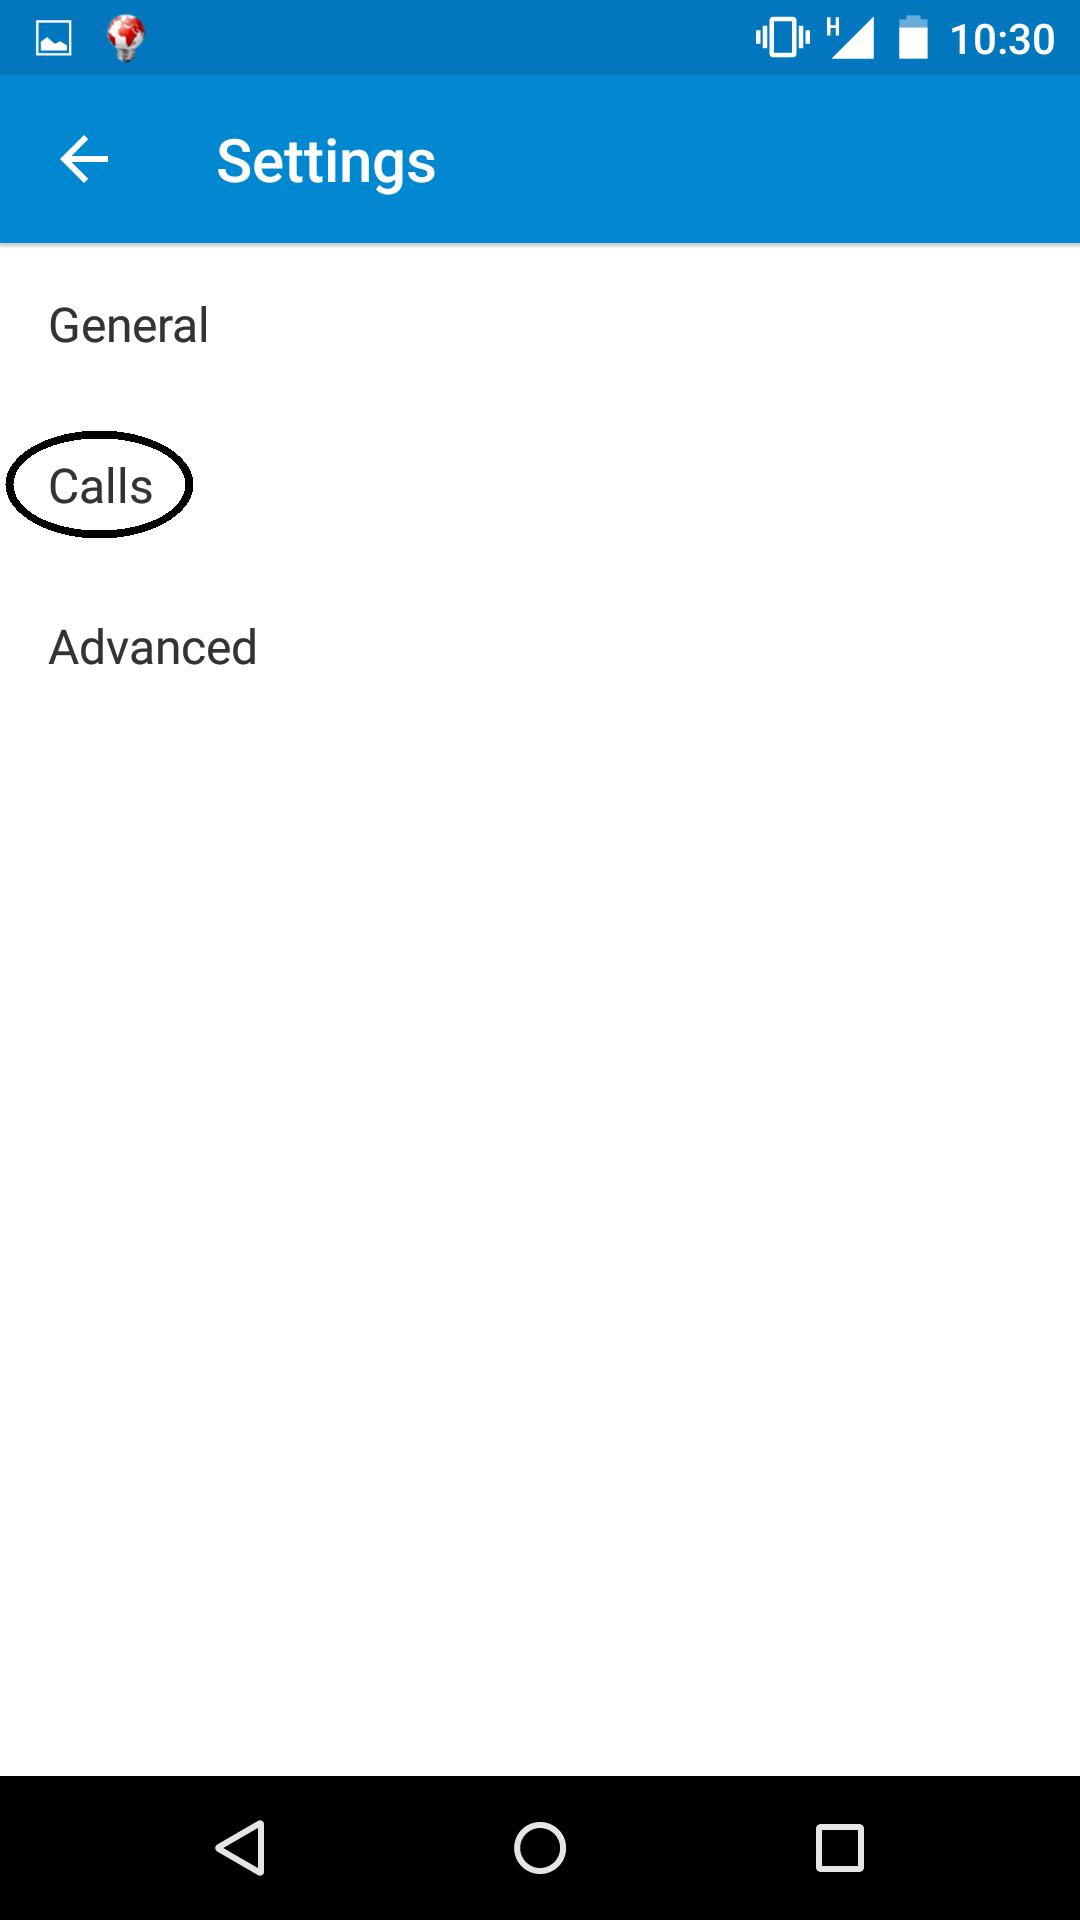 Select 'Calls'